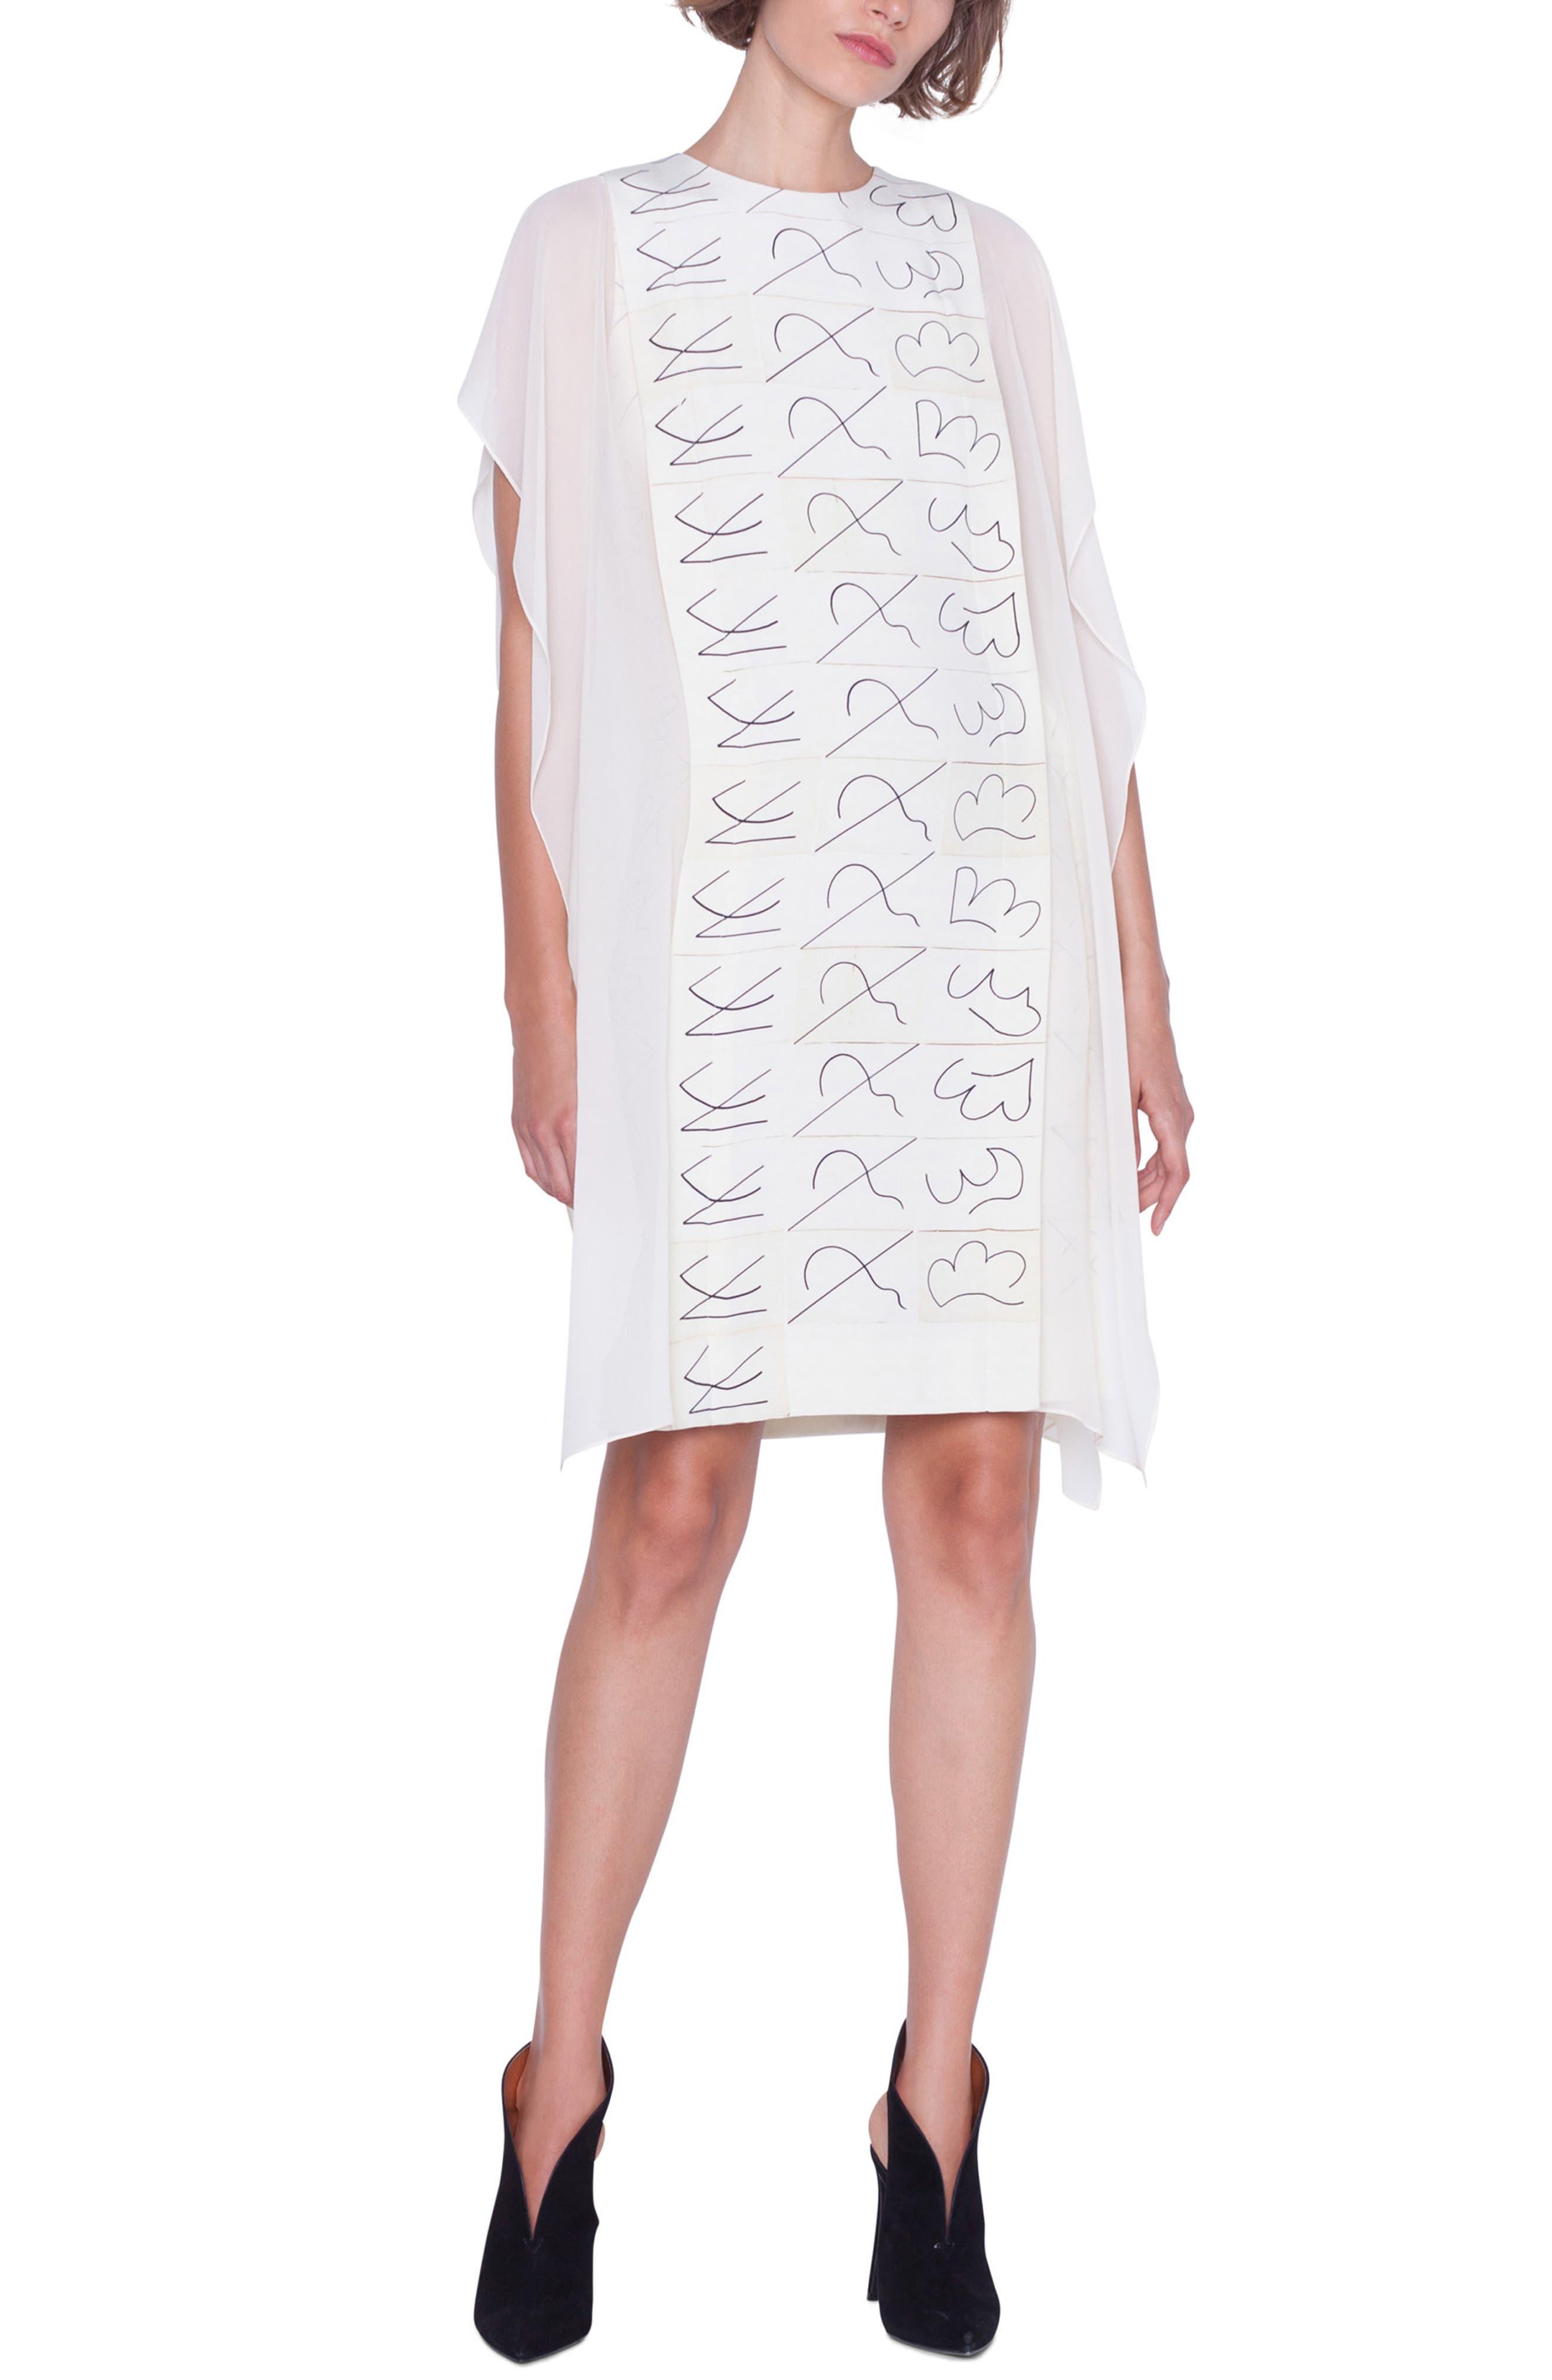 AKRIS, Leporello Print Cold Shoulder Silk Dress, Alternate thumbnail 3, color, PAPER